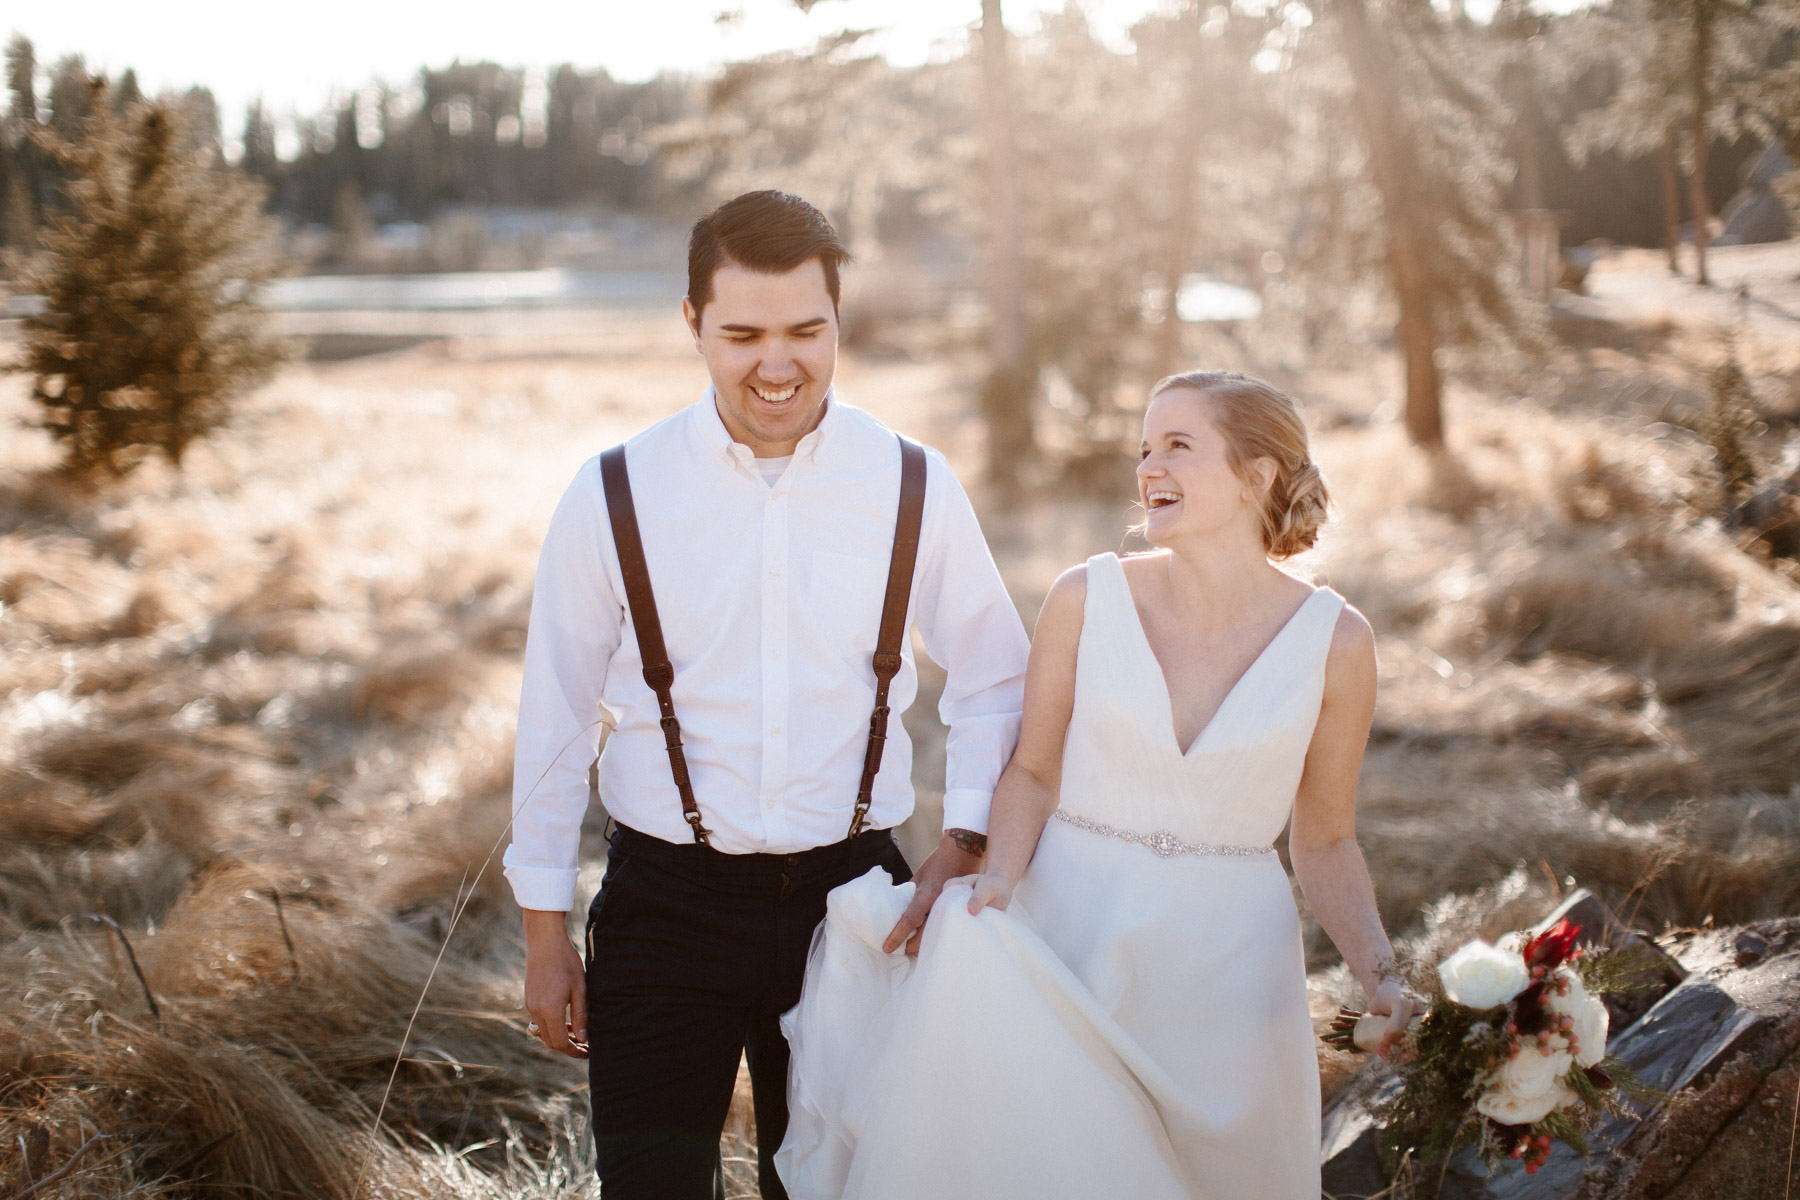 sioux-falls-black-hills-rapid-city-elopement-wedding-adventure-photographer-custer-sylvan-lake-23.jpg